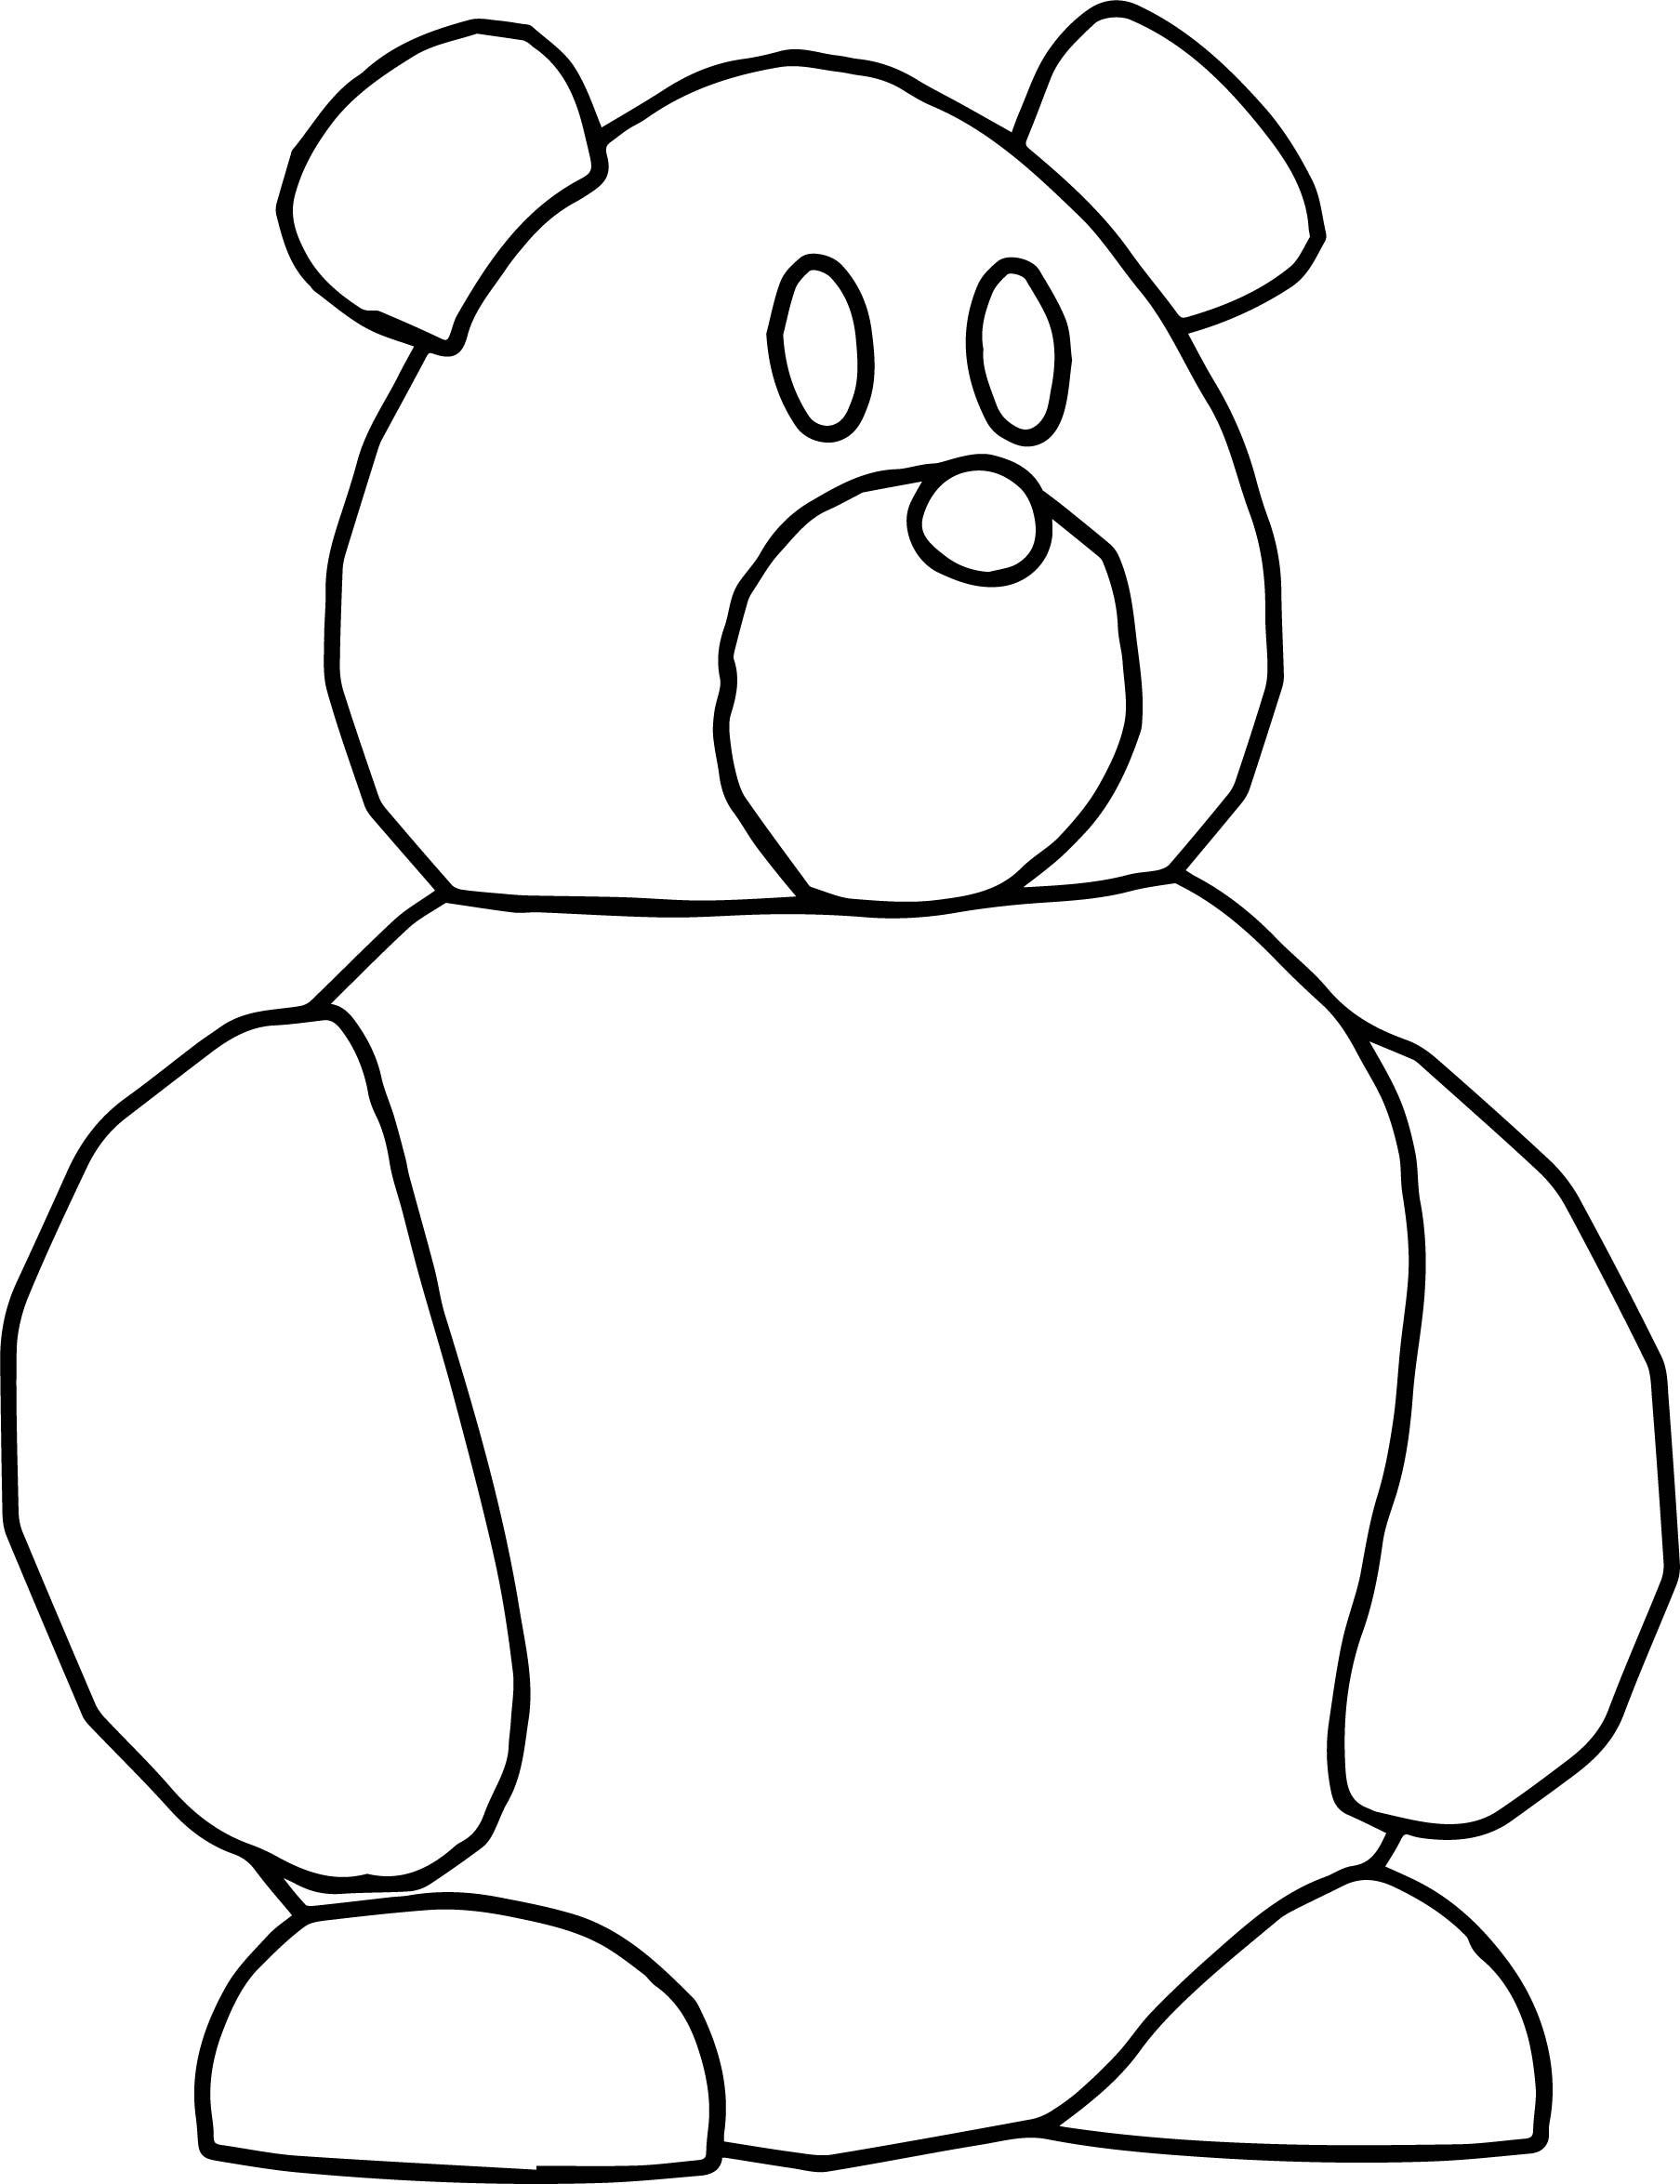 Bear Too Basic Cartoon Coloring Page